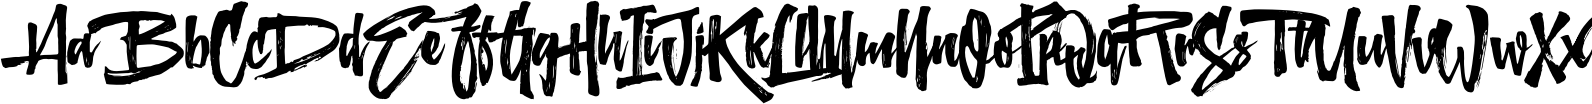 Northshire Script